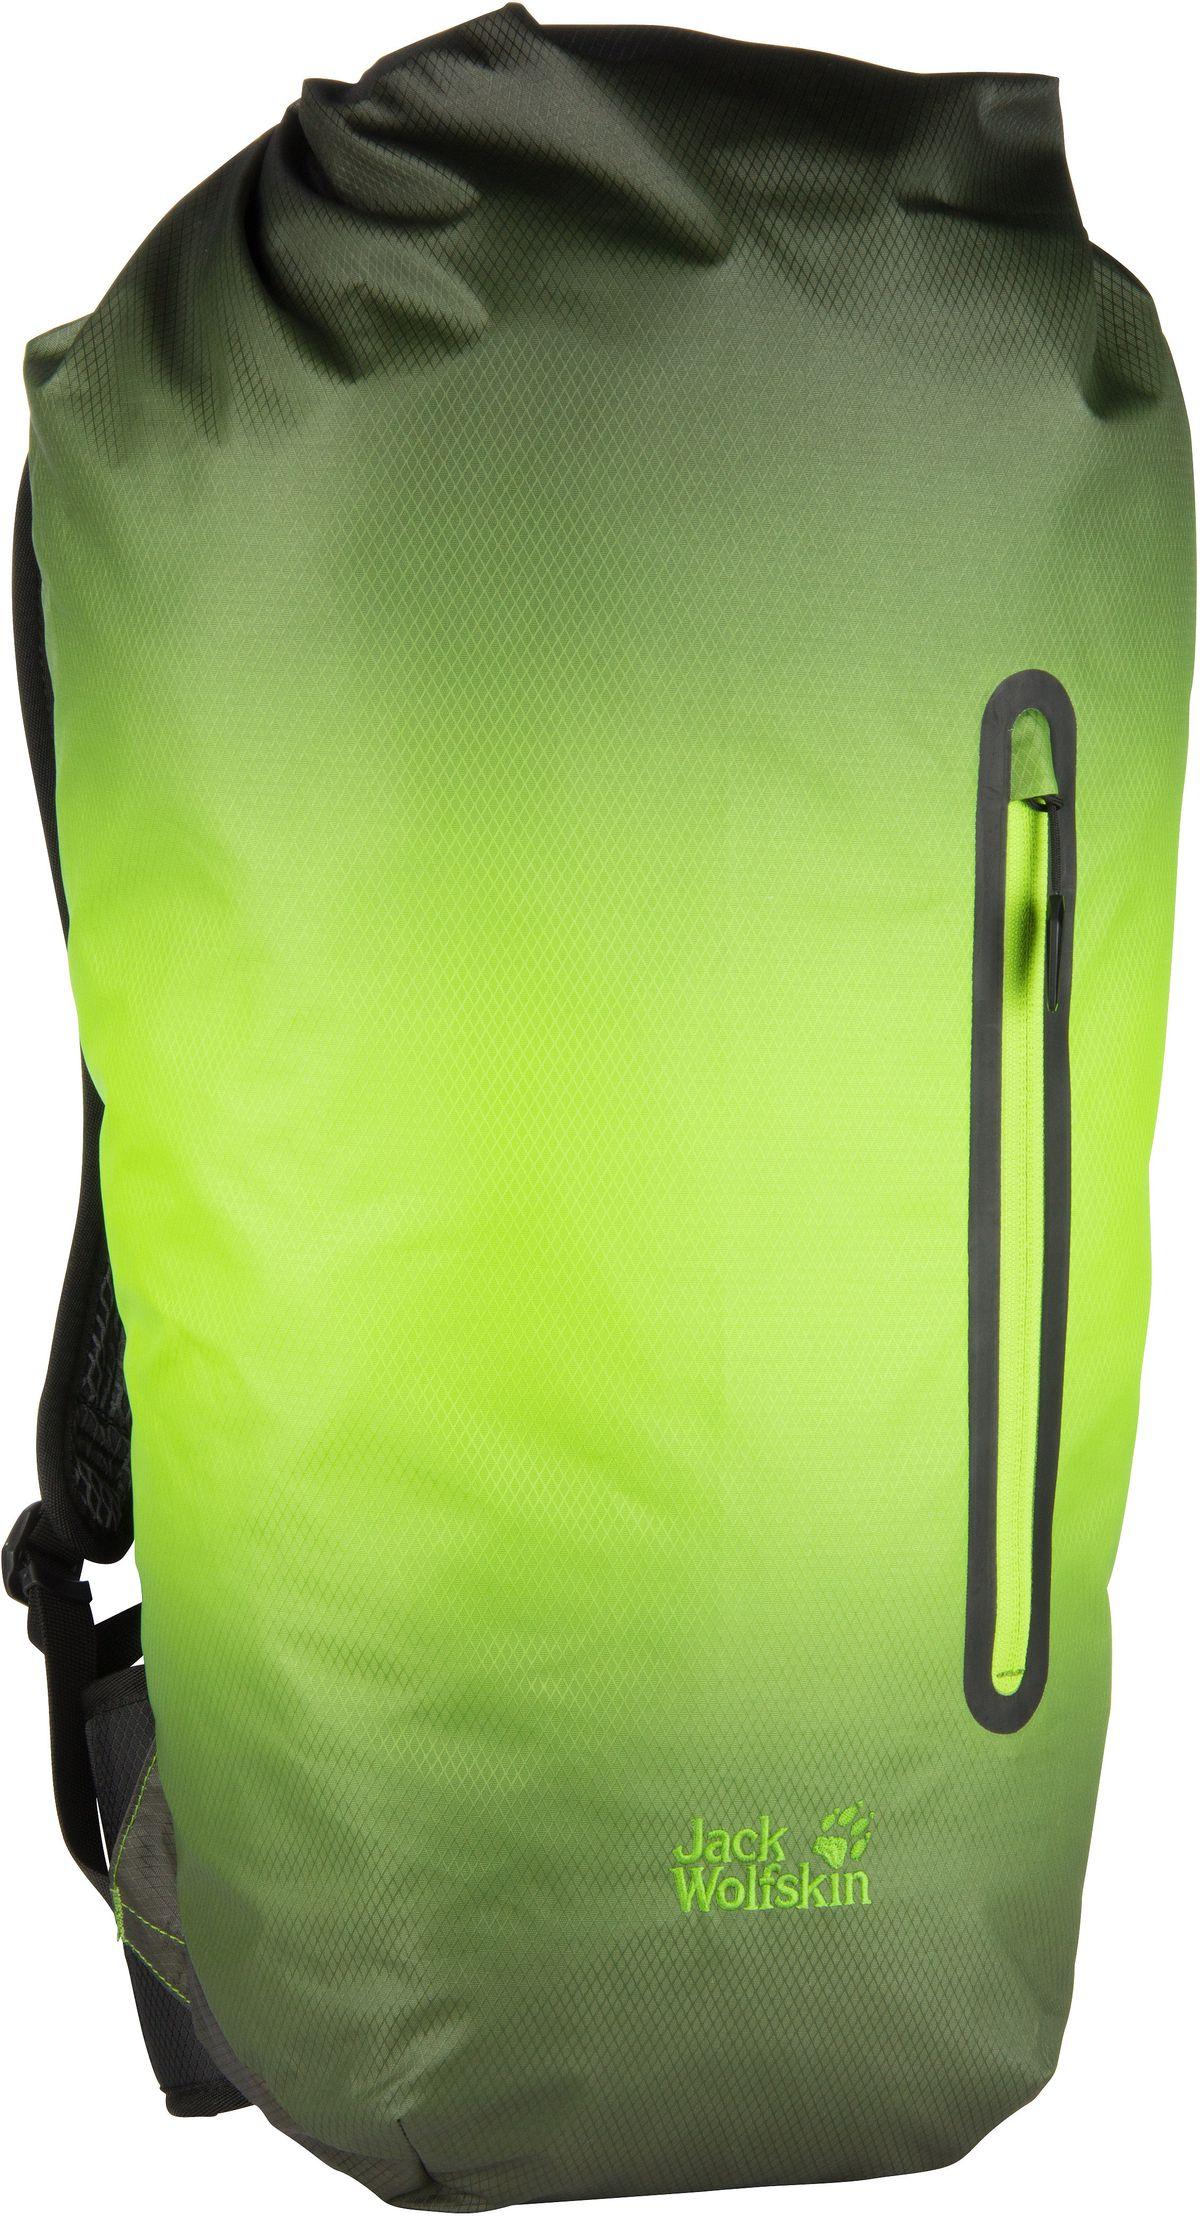 Rucksack / Daypack Halo 24 Pack Corona Lime (24 Liter)